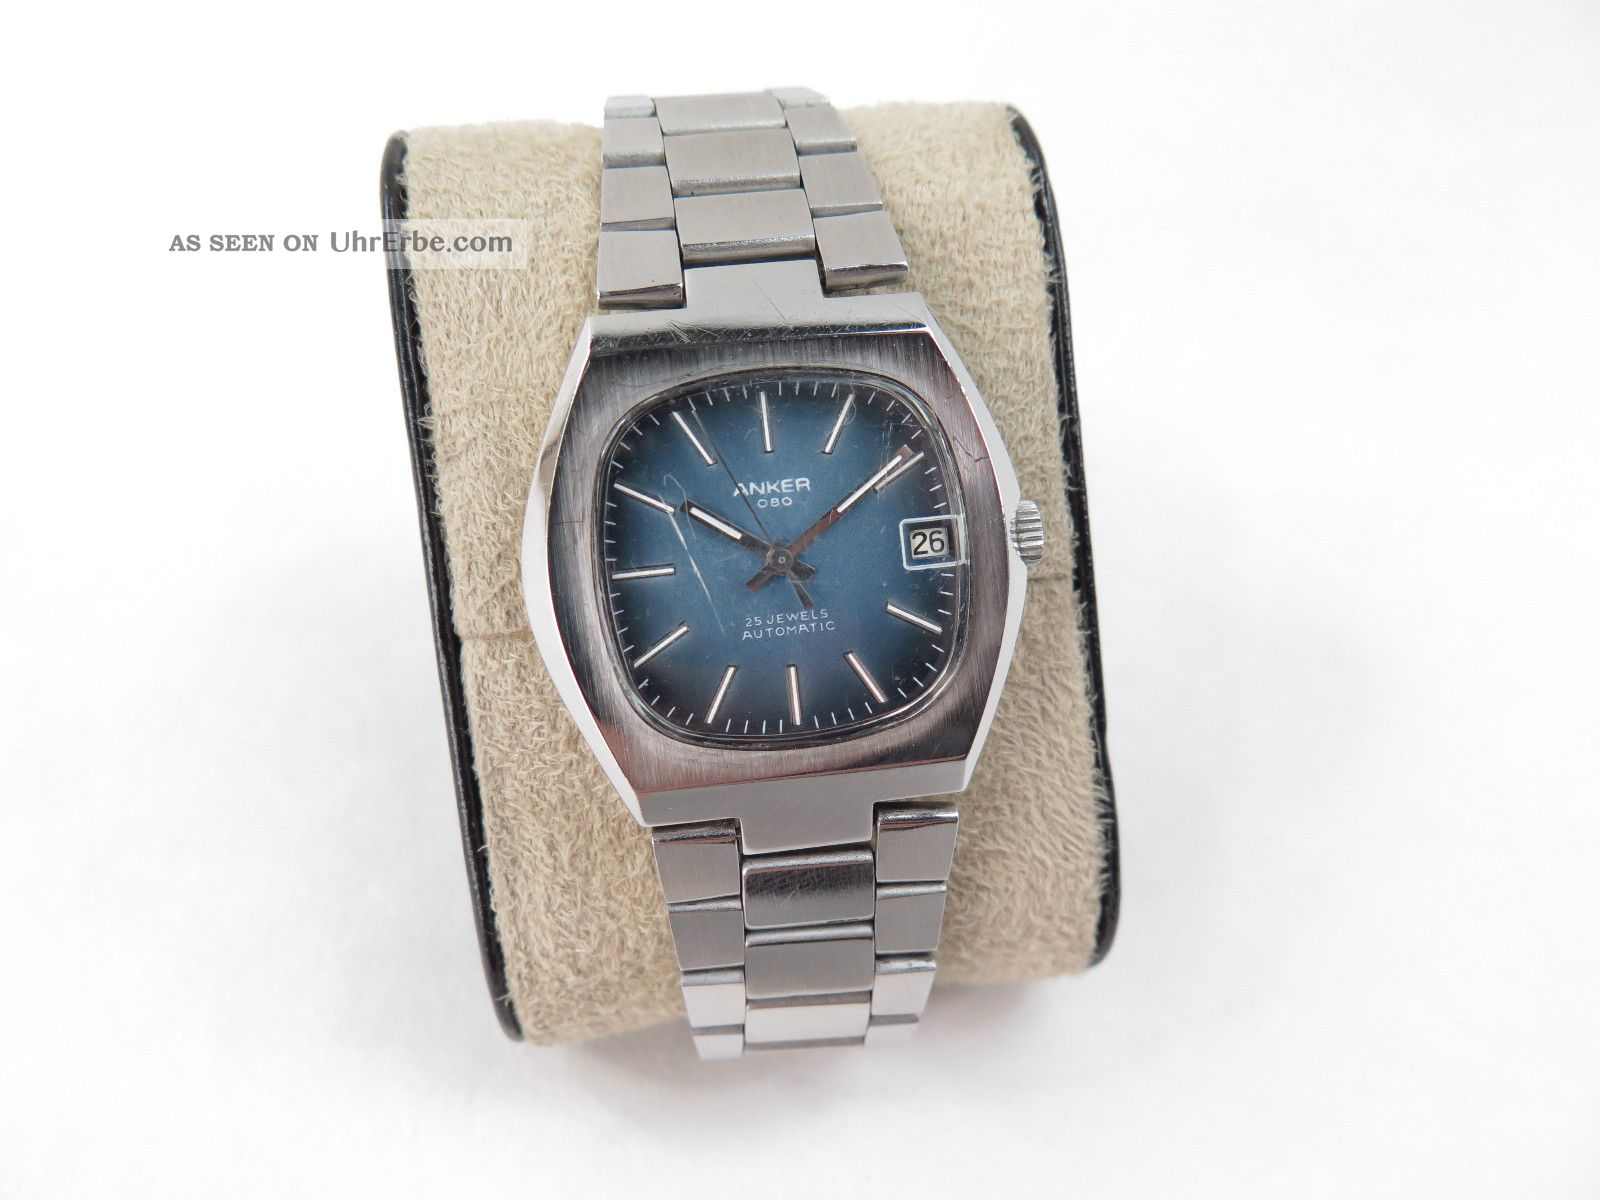 Anker 080 Automatic Armbanduhr Armbanduhren Bild